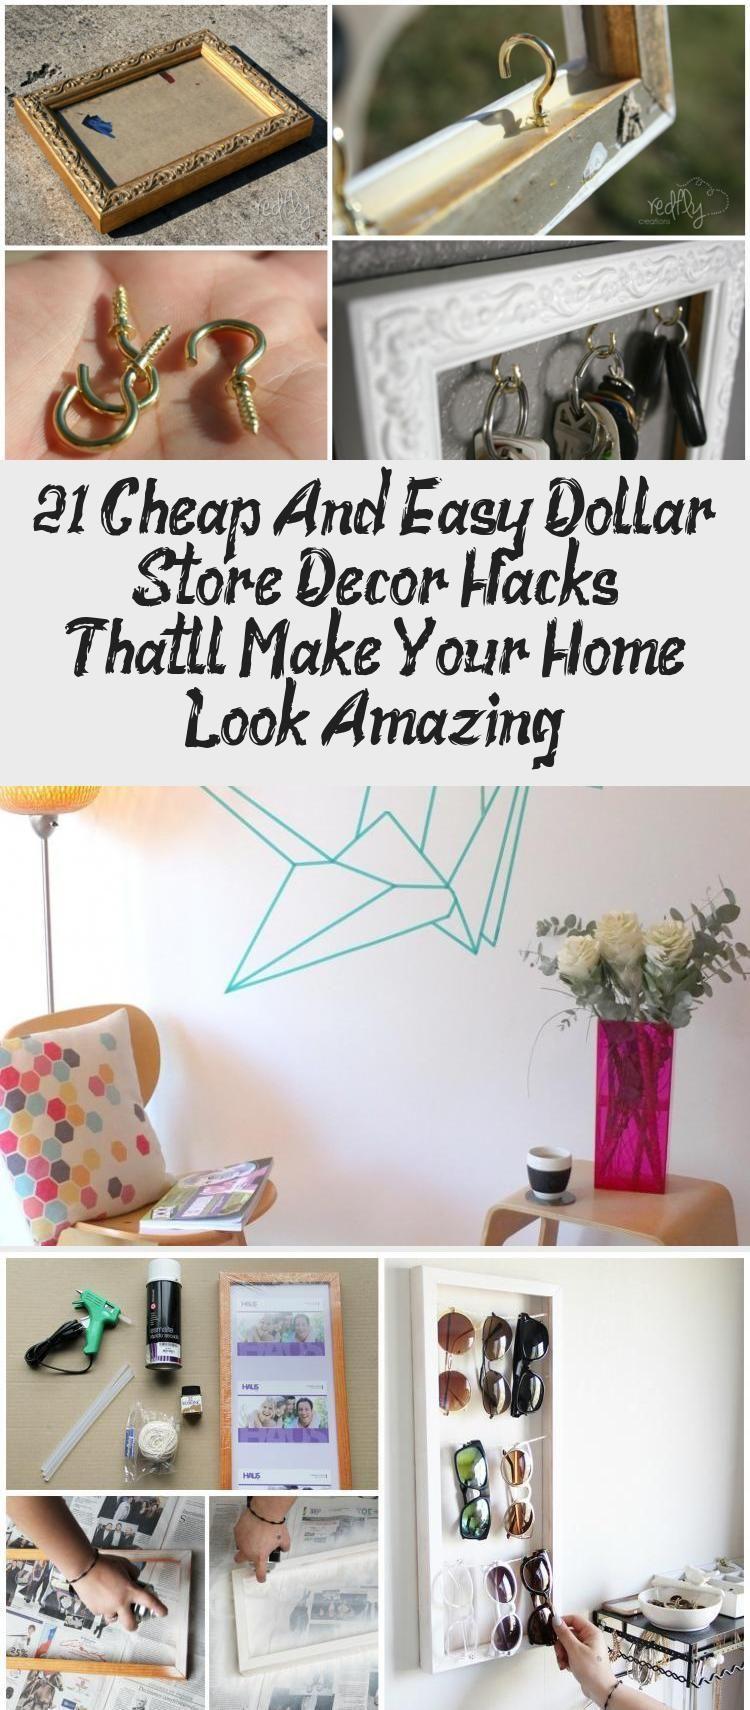 Cheap Home Decor Hacks Home Decor Hacks Dollar Store Decor Decor Hacks Diy